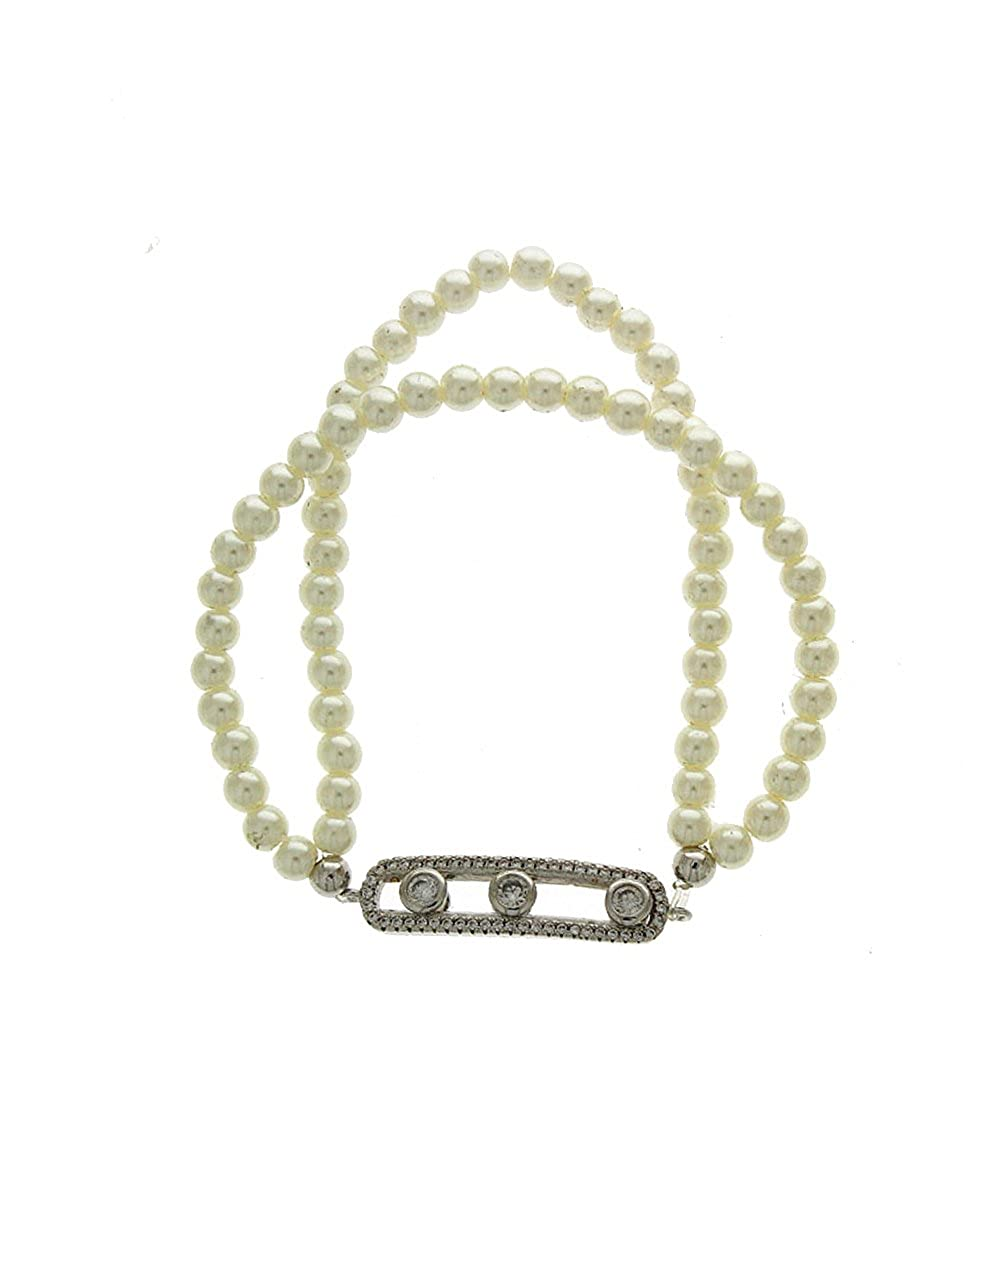 Anuradha Art Silver Finish Pearl Beads Classy Looking Hand Bracelet//Kada for Women//Girls